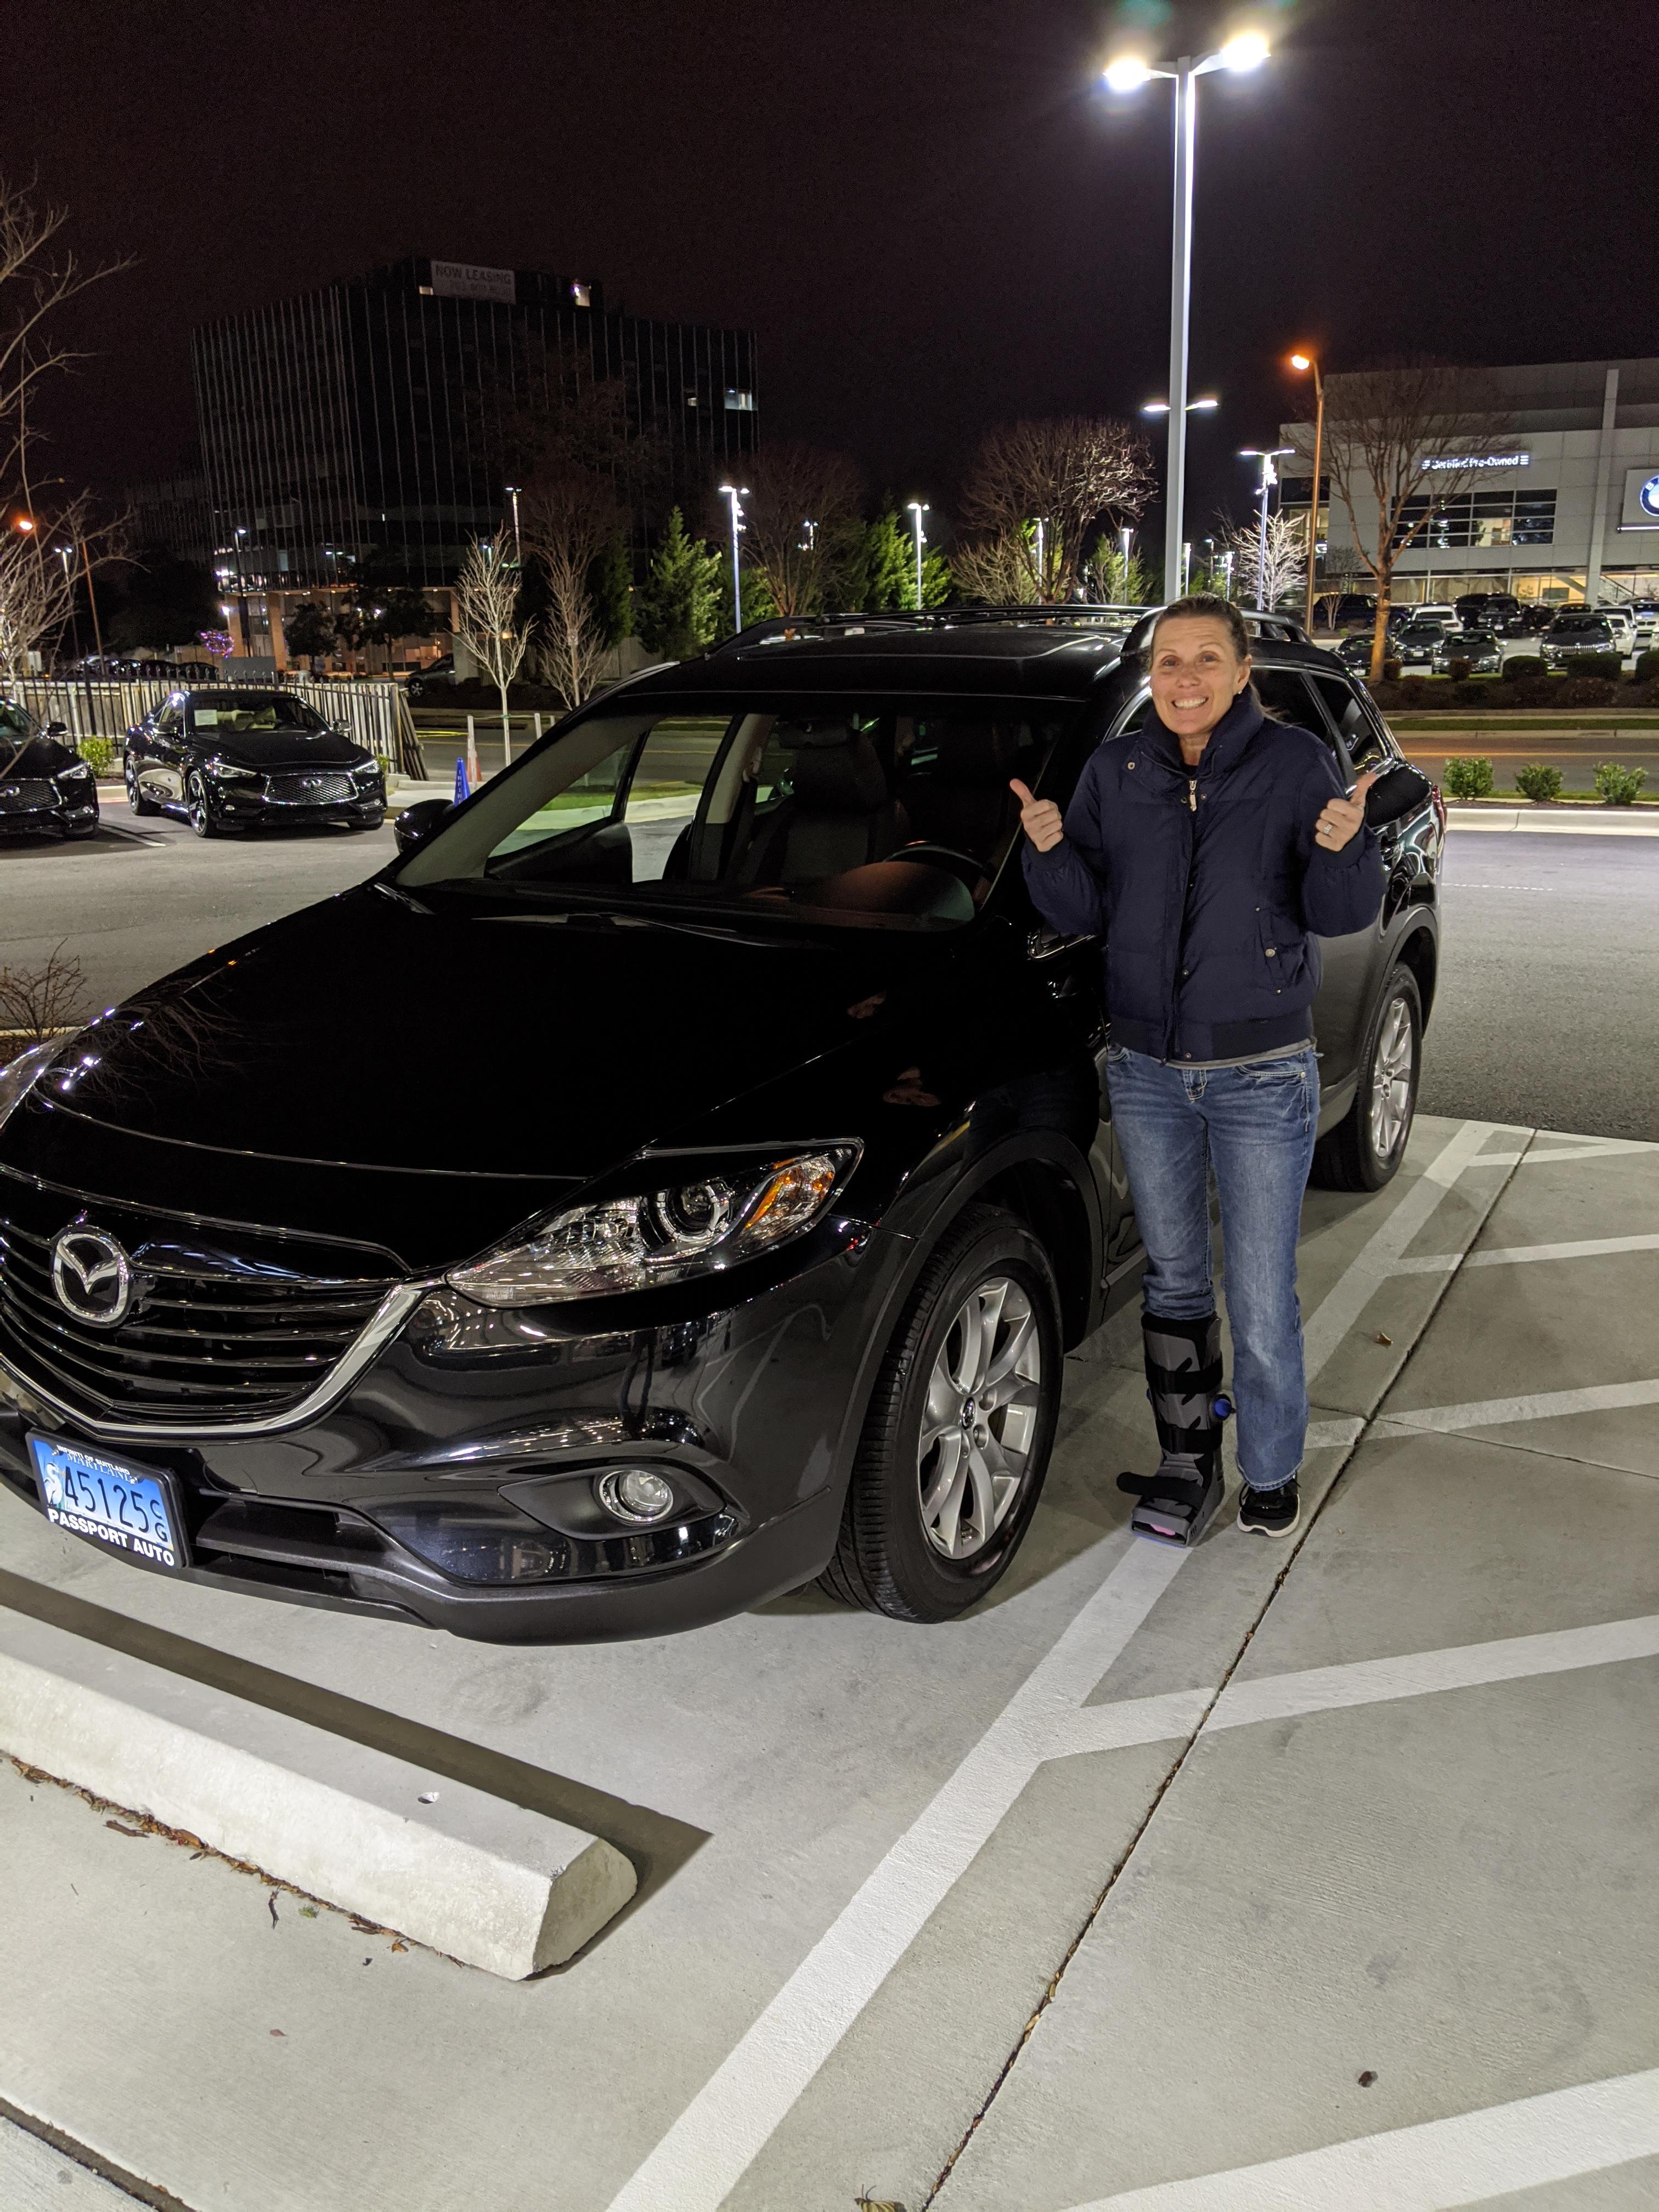 Mimi new to us car 2019